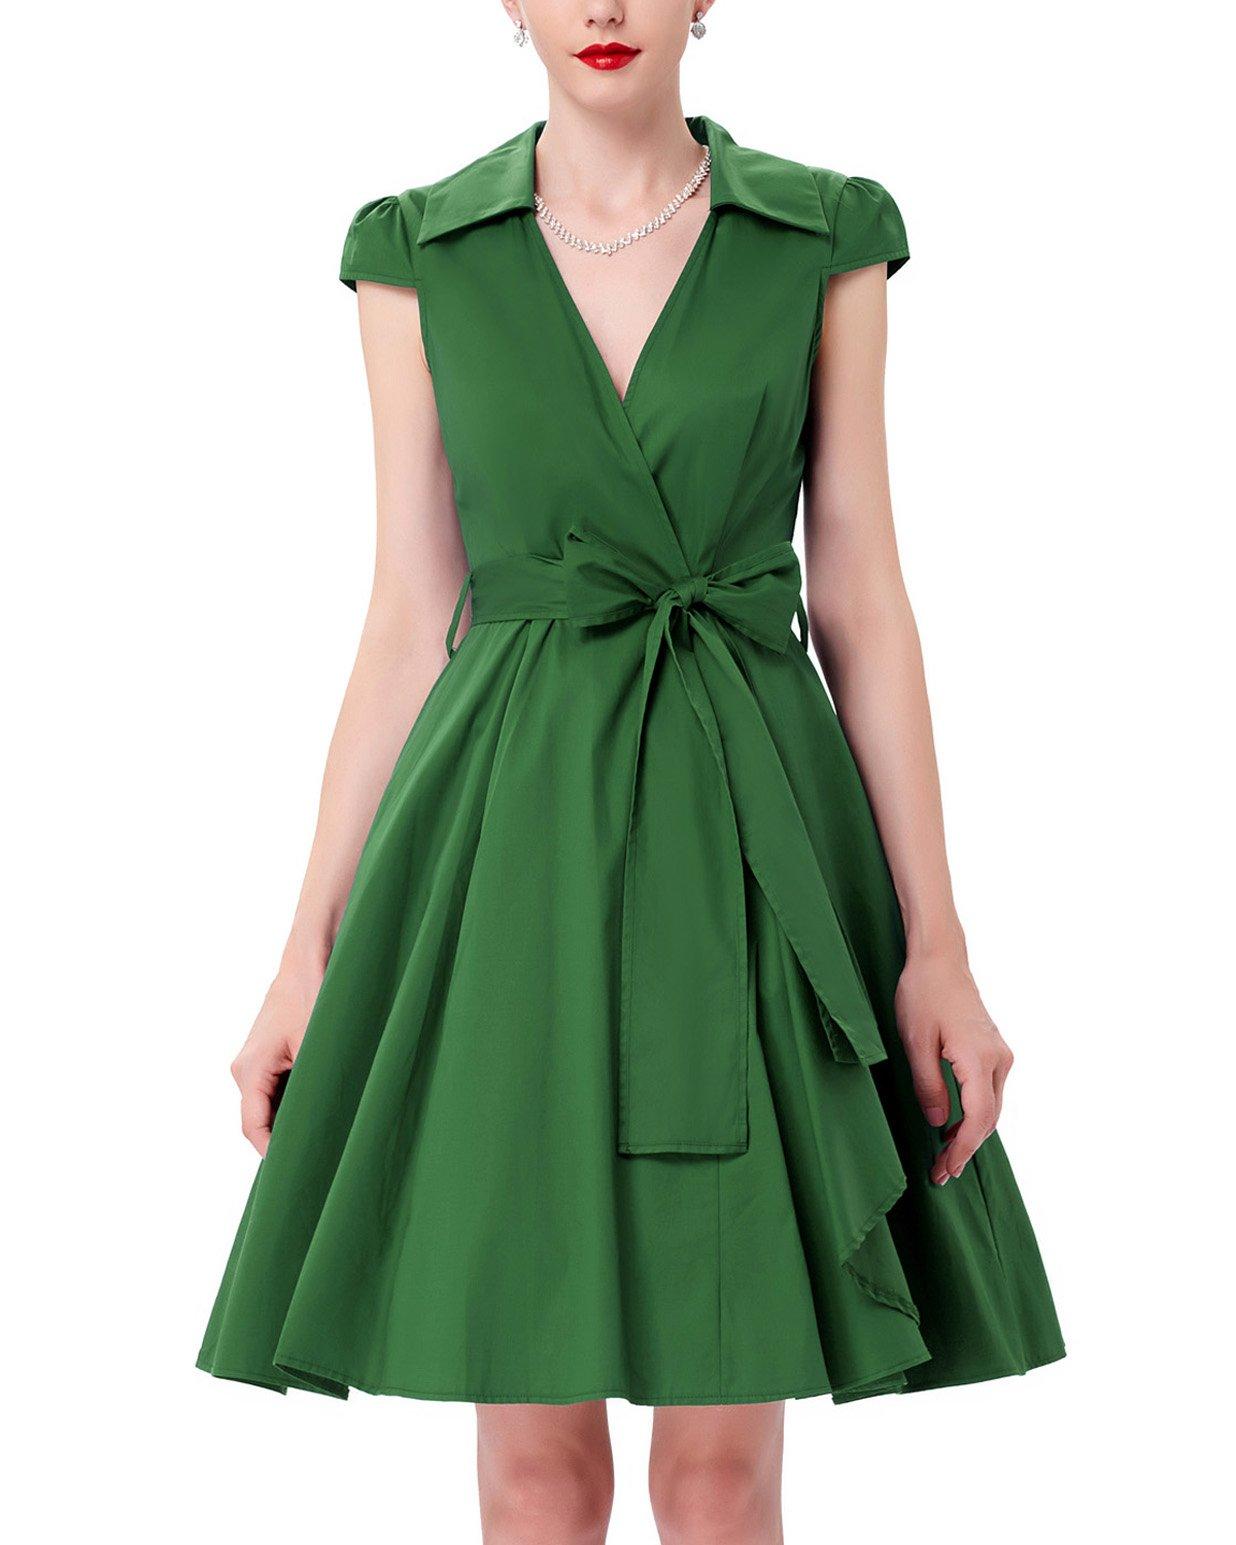 Grace Karin Women's Lapel Collar Wrap Dresses,Large,Green 6087-9